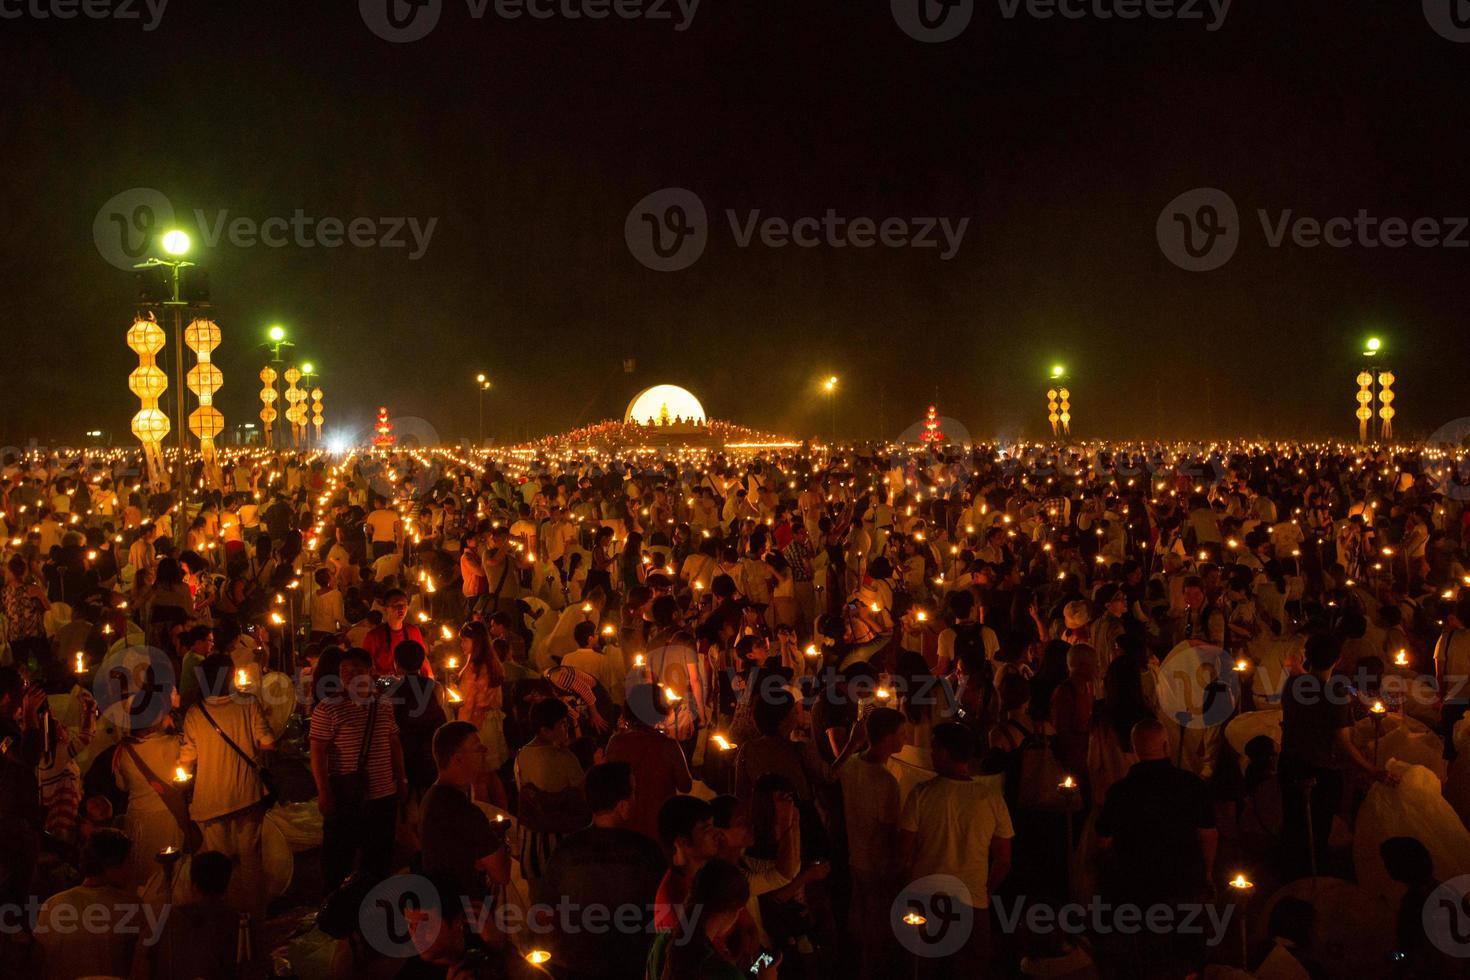 mae jo, chiangmai, thaïlande - 25 octobre 2014: lanterne flottante, photo